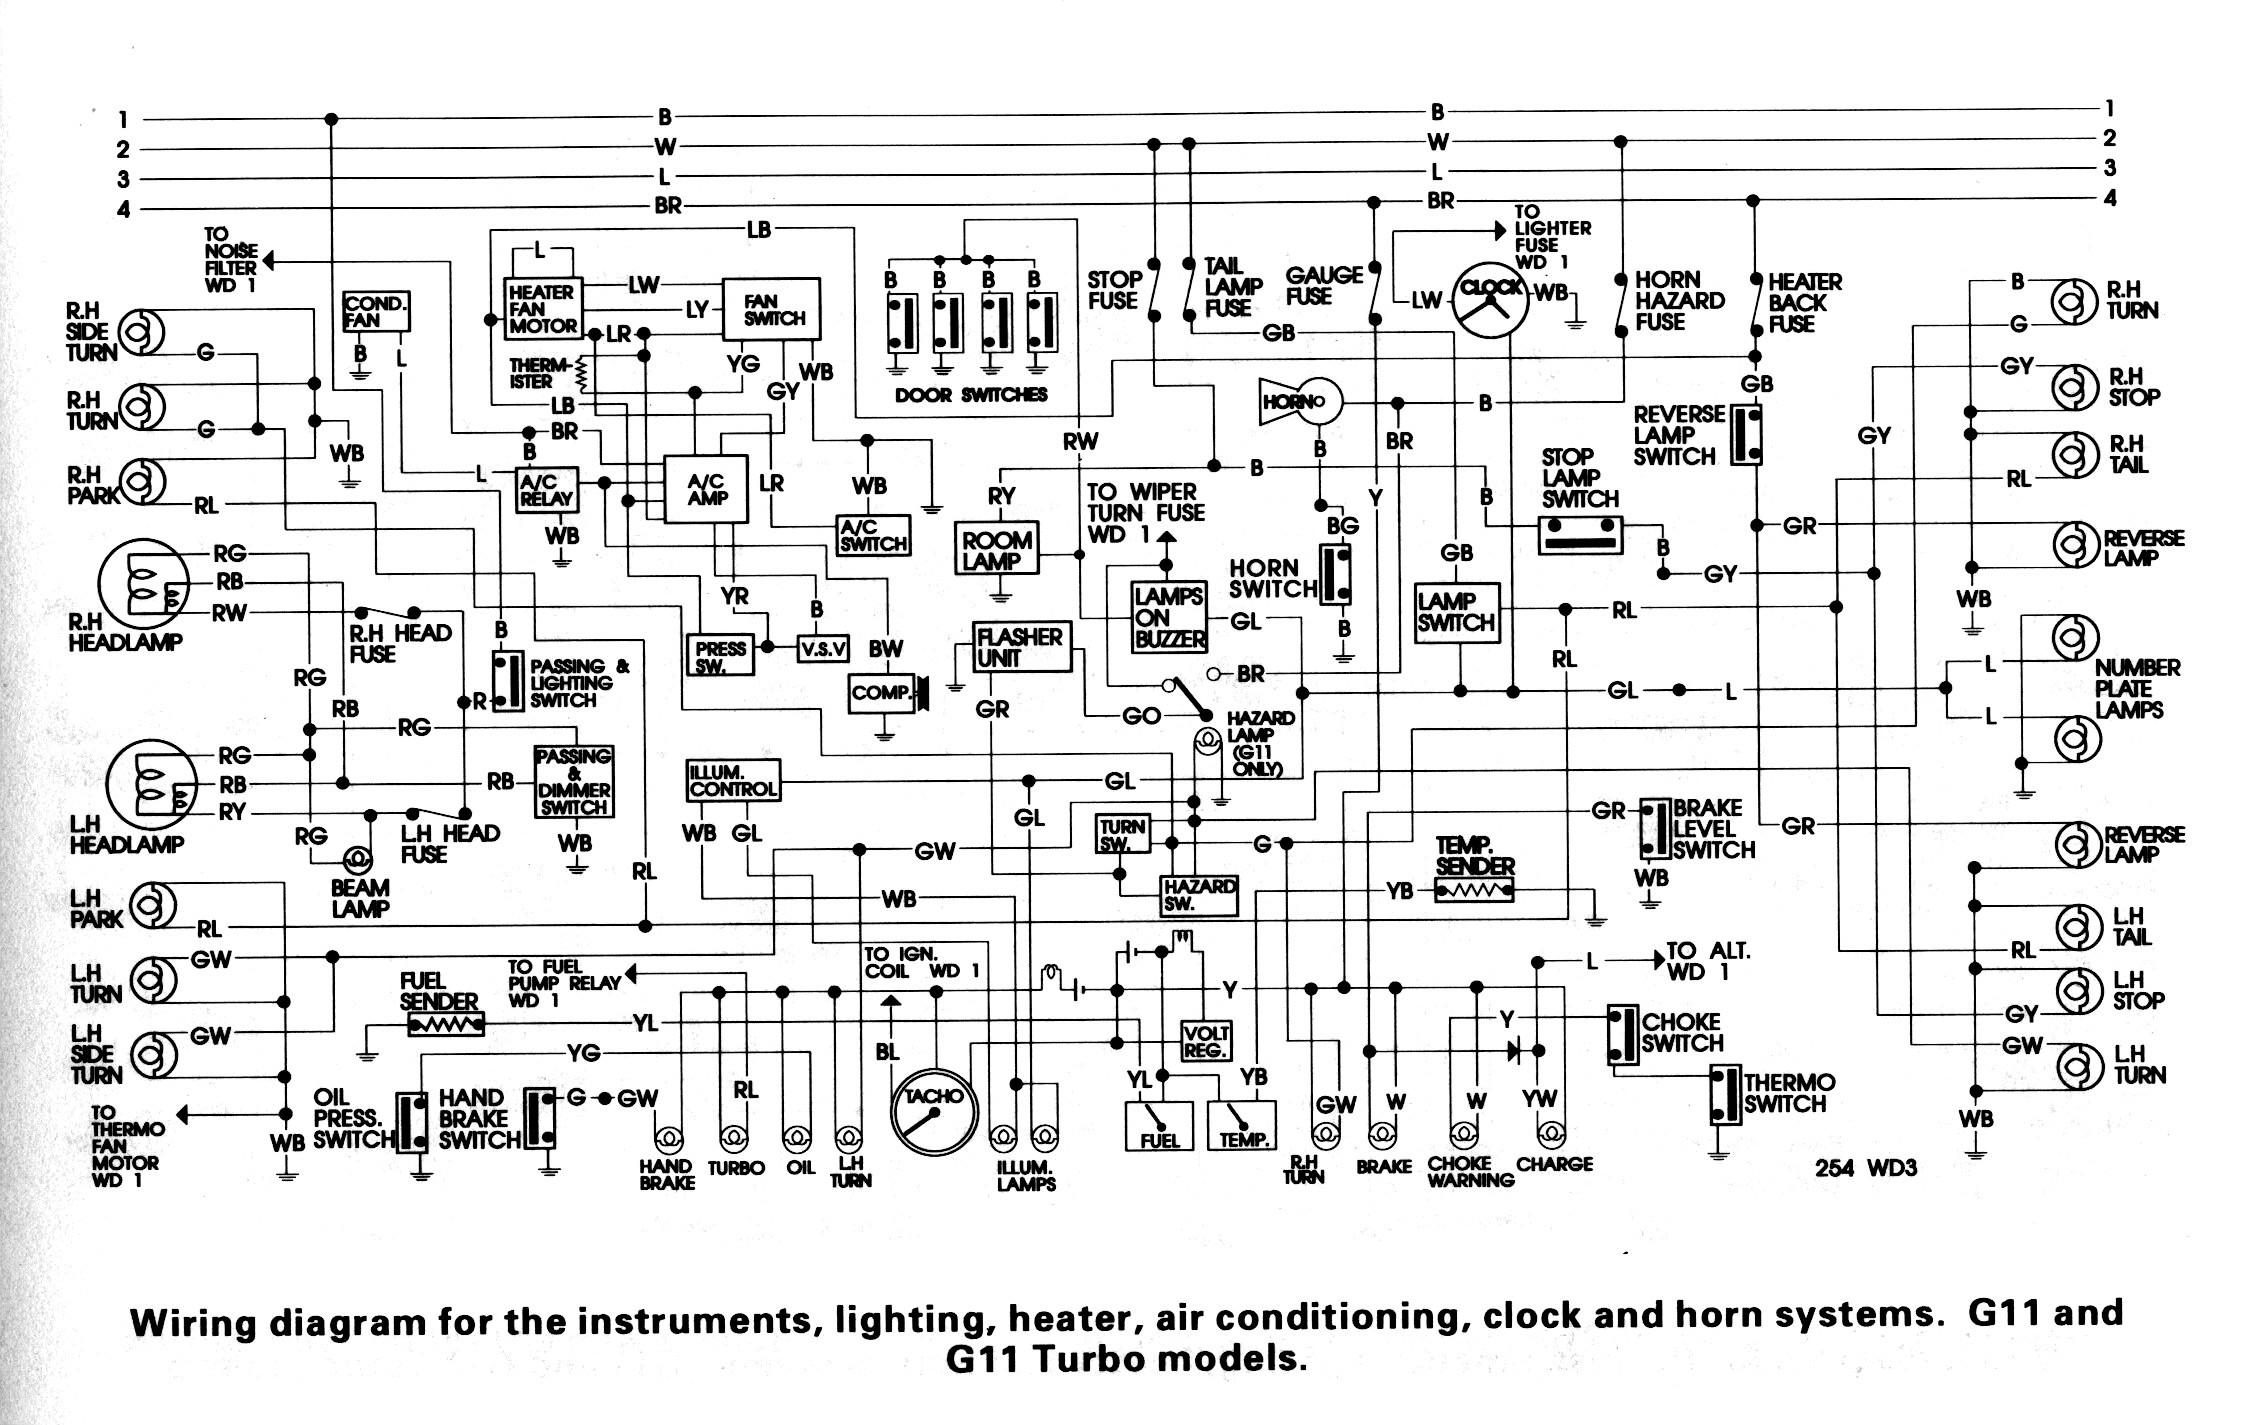 Fuse Box Daihatsu Classy - 1999 Monte Carlo Engine Diagram for Wiring  Diagram SchematicsWiring Diagram Schematics